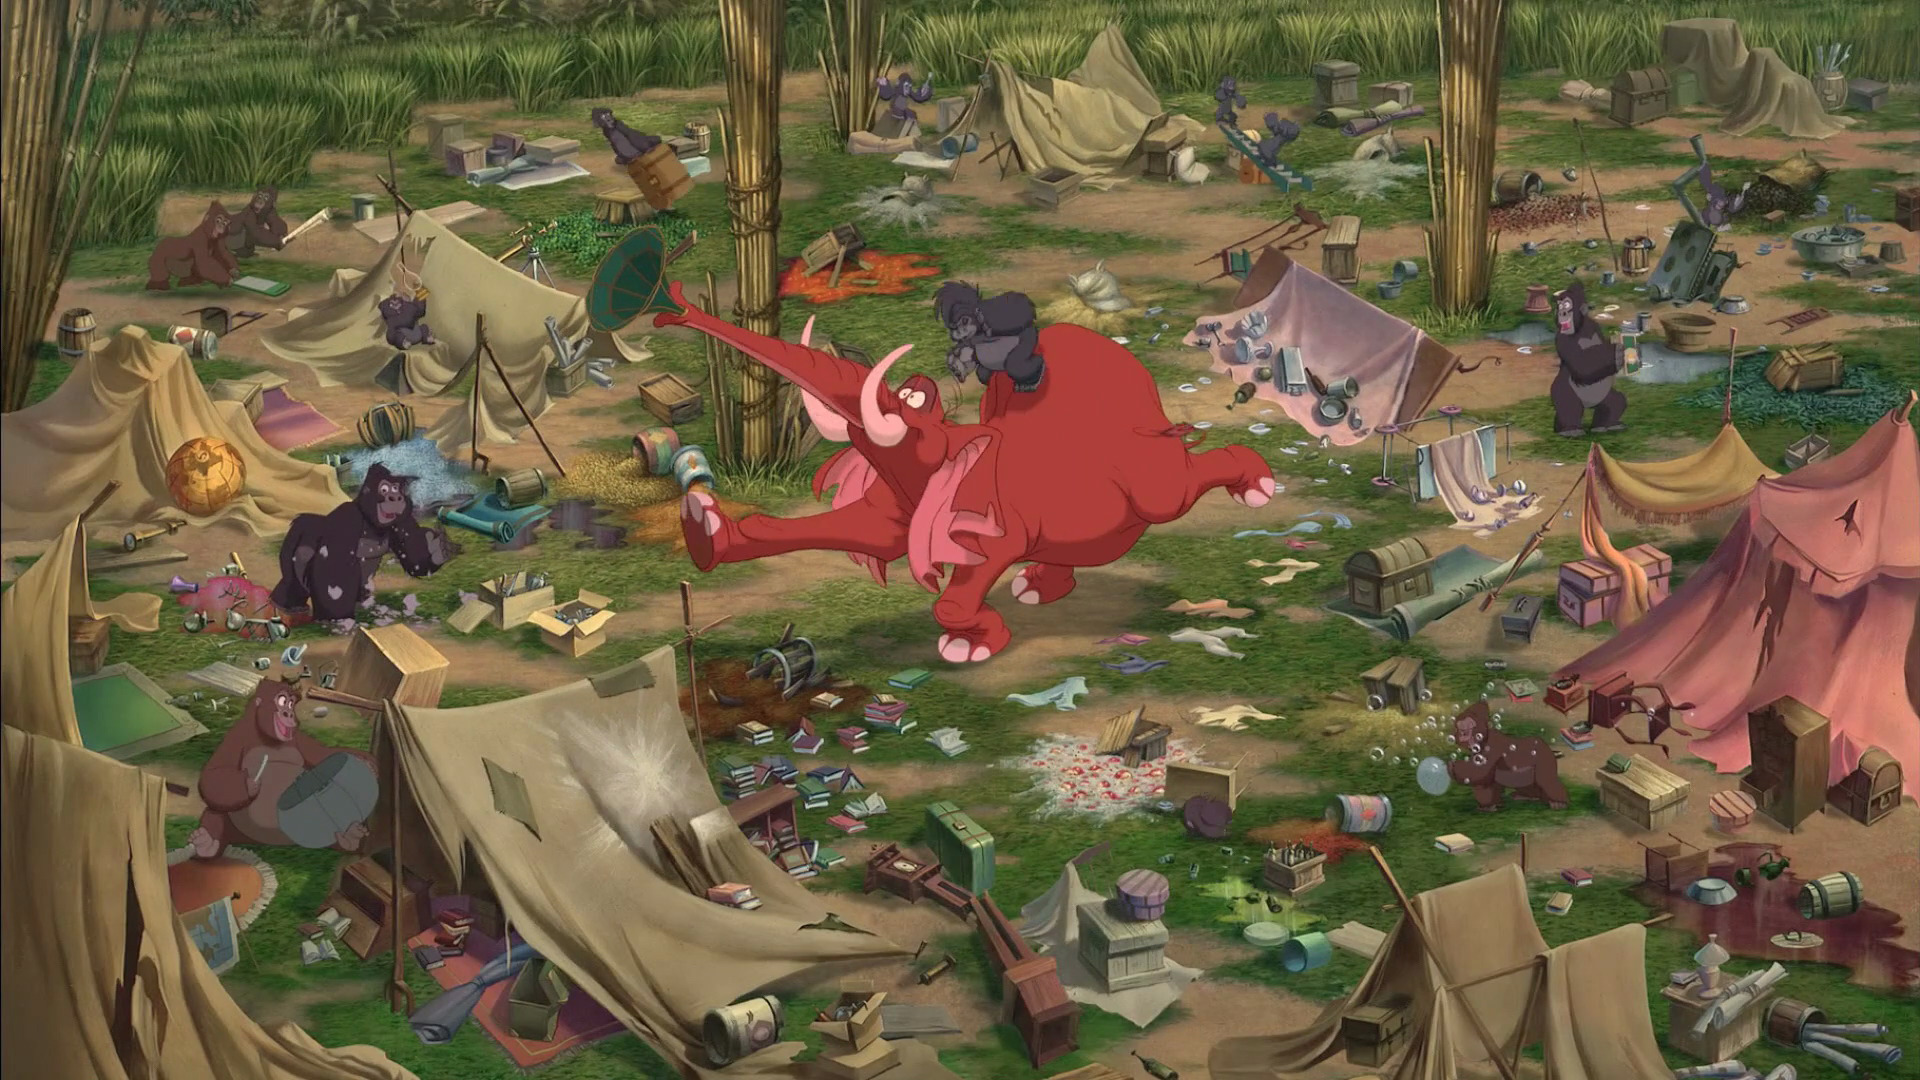 Tarzan and jane at cartoon sex scene 2